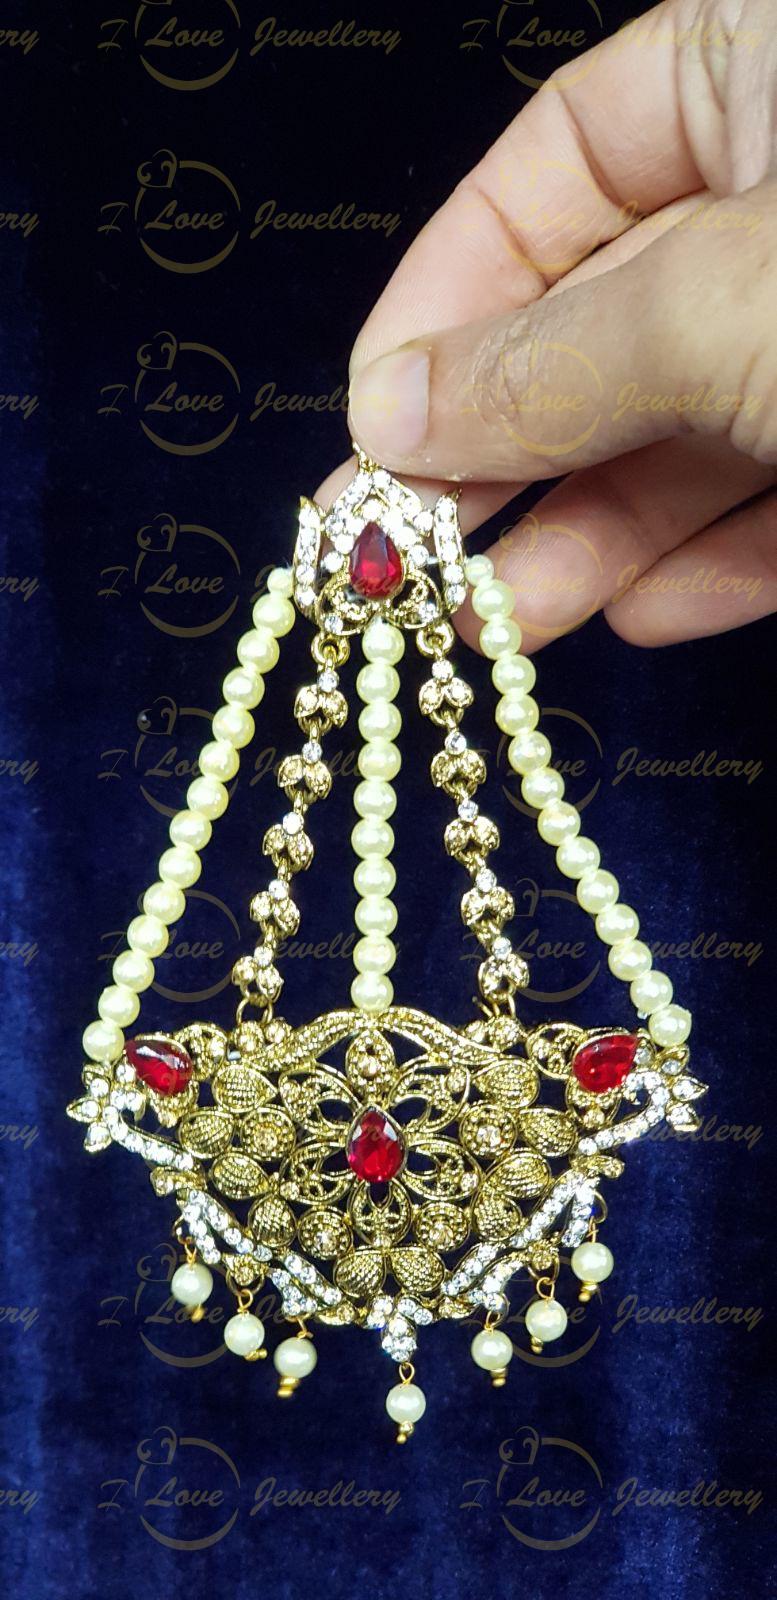 Jhoomar tikka - bindi tikka - collection of Pakistani jhoomar tikka sets - wholesale Pakistani jewellery - bespoke Pakistani jewellery